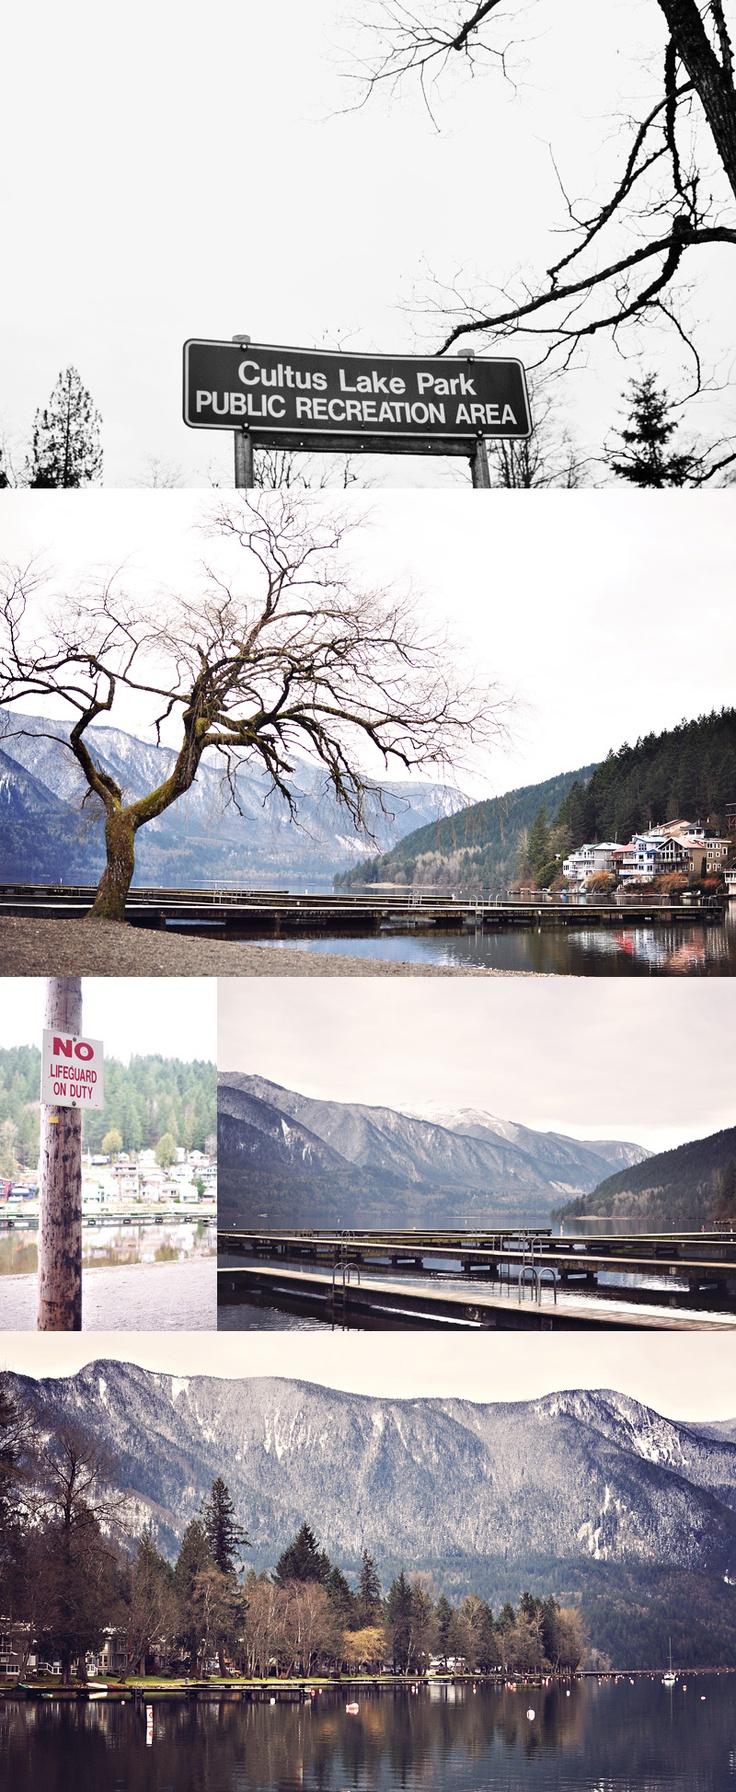 Cultus Lake in the winter! #peaceful #winter #Cultus